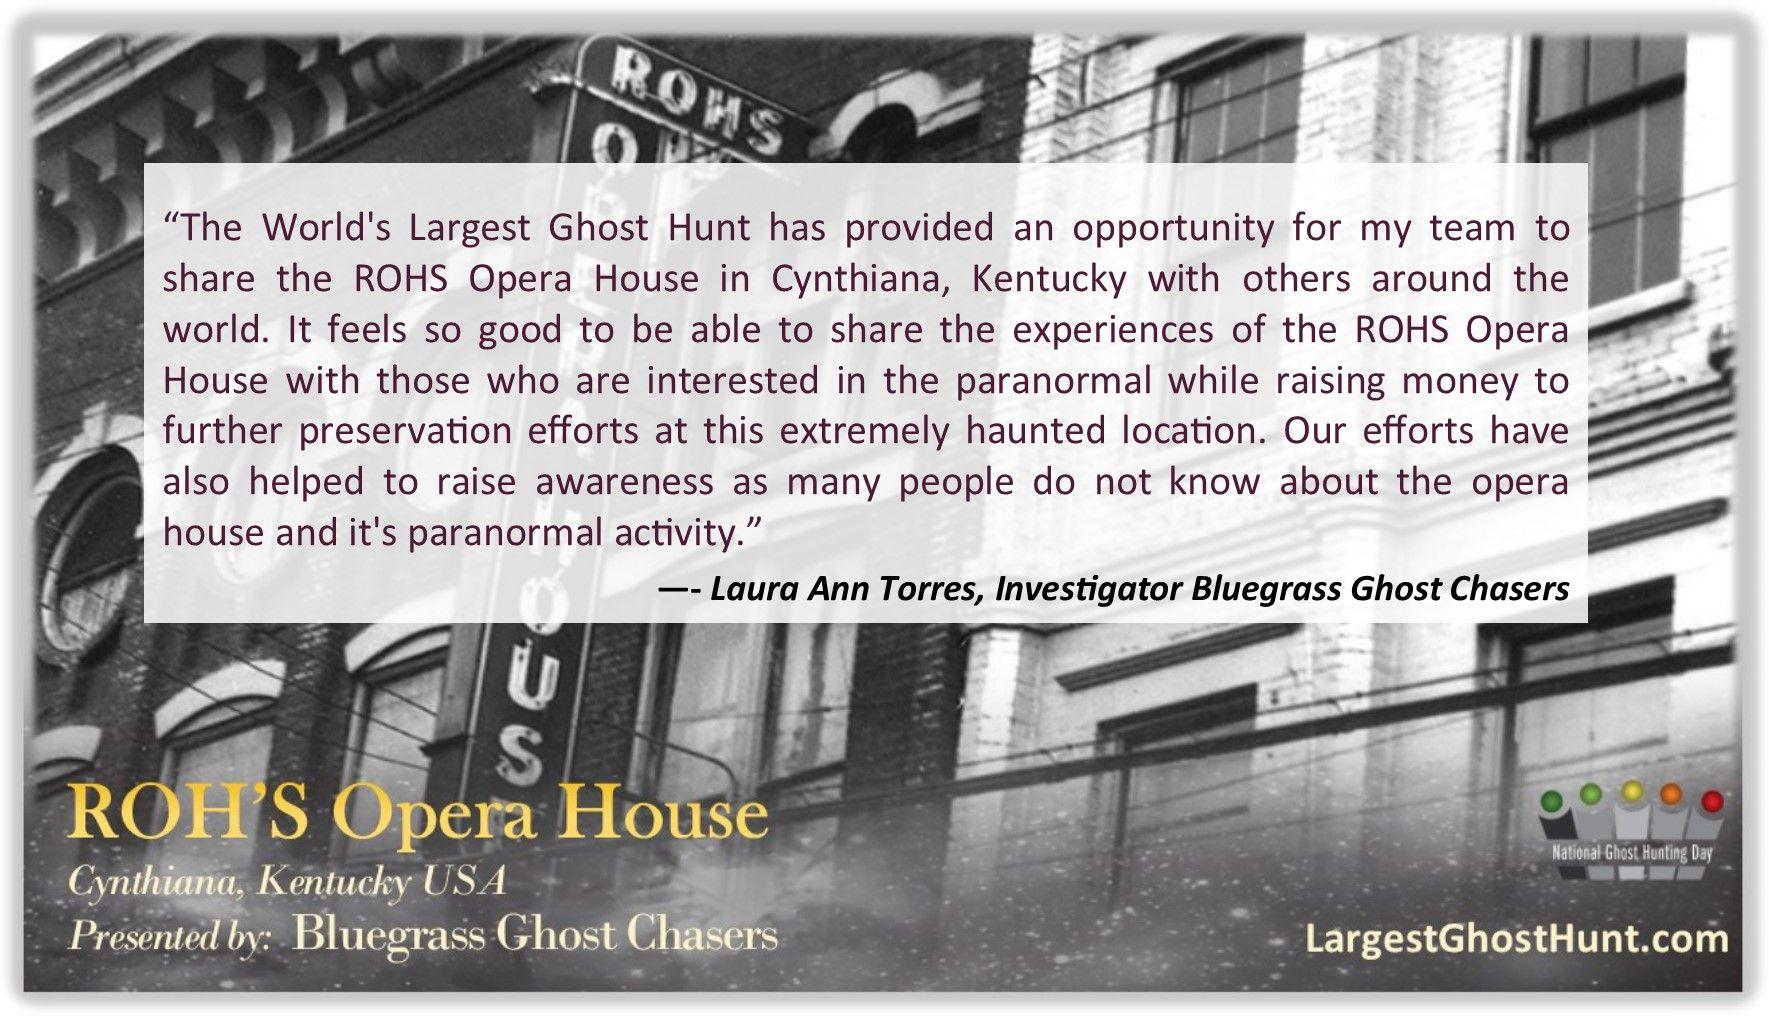 ROH's Opera House